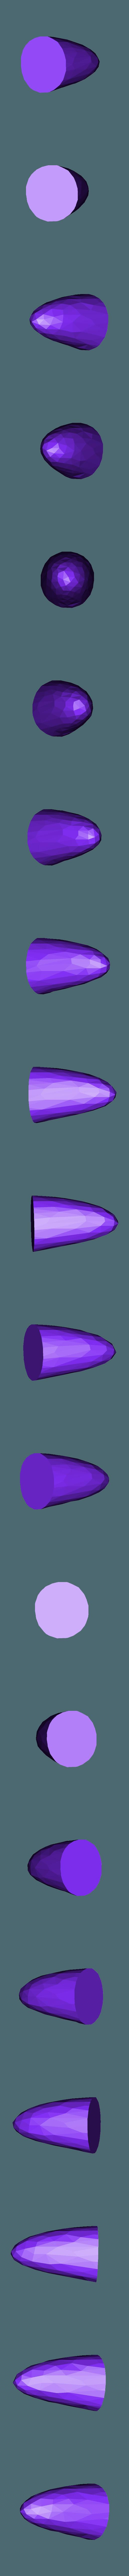 left_ear_black.stl Download free STL file Pikachu MMU multi color with removable tail • 3D print design, Jangie